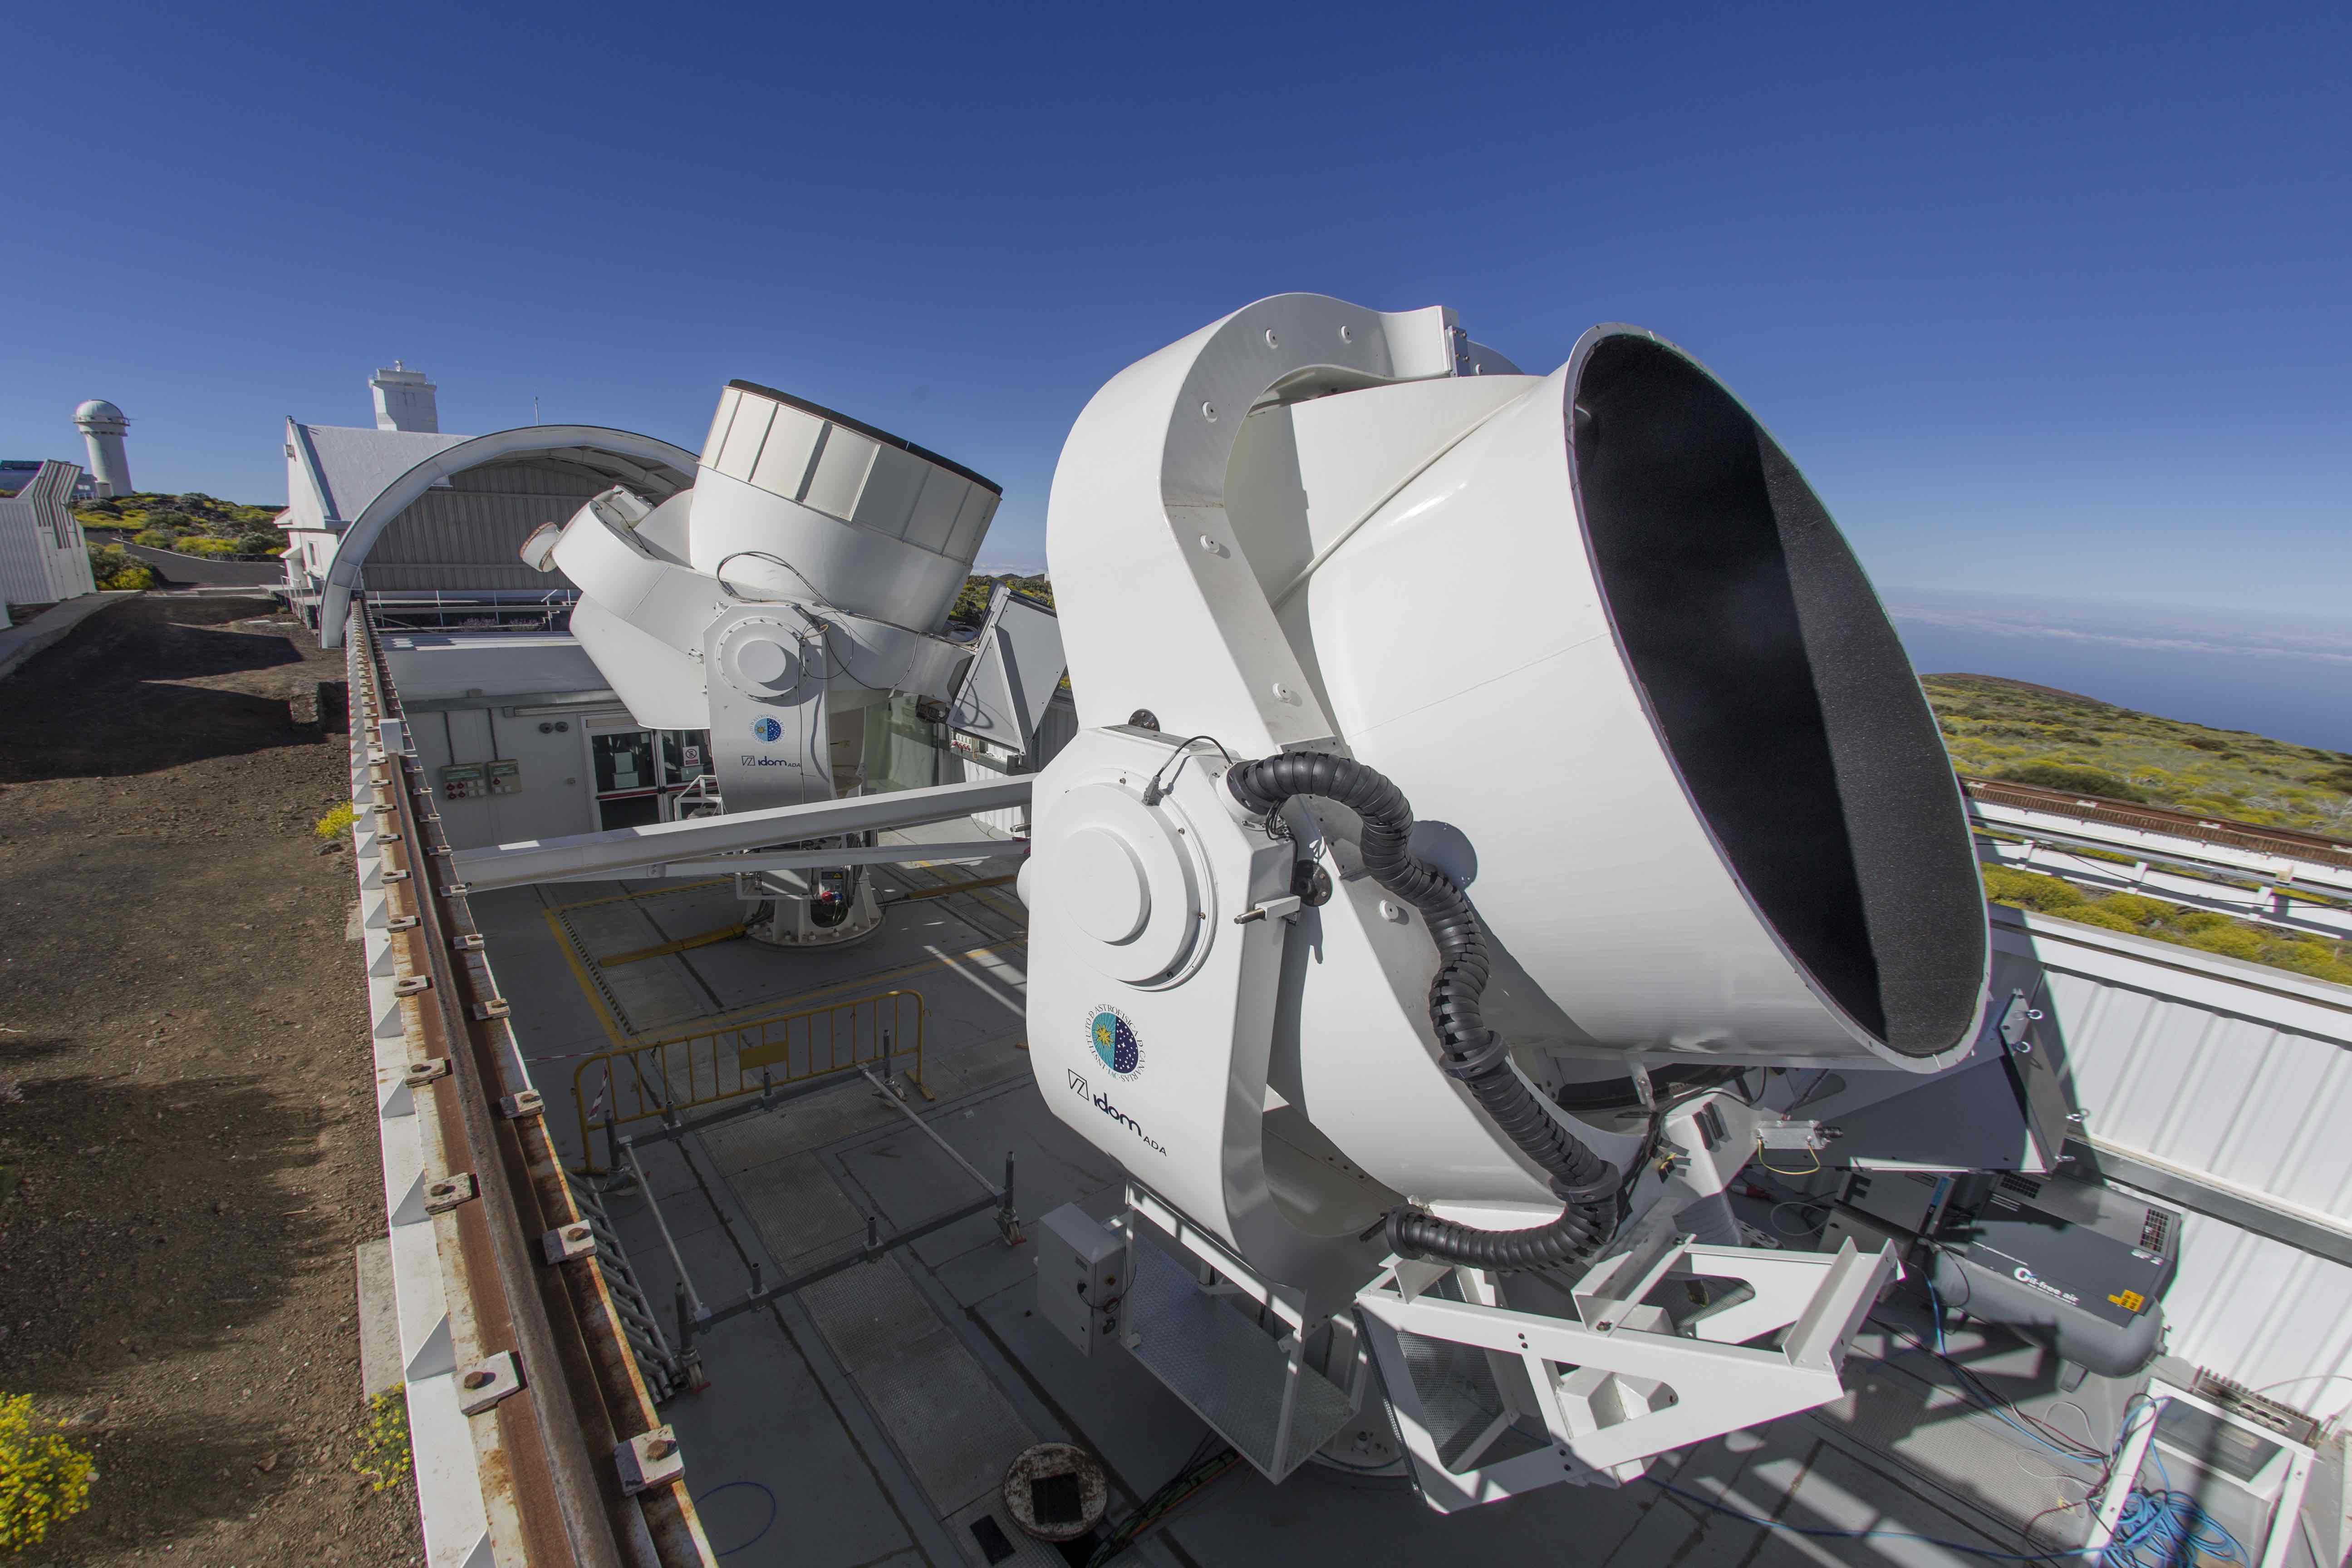 Two QUIJOTE telescopes